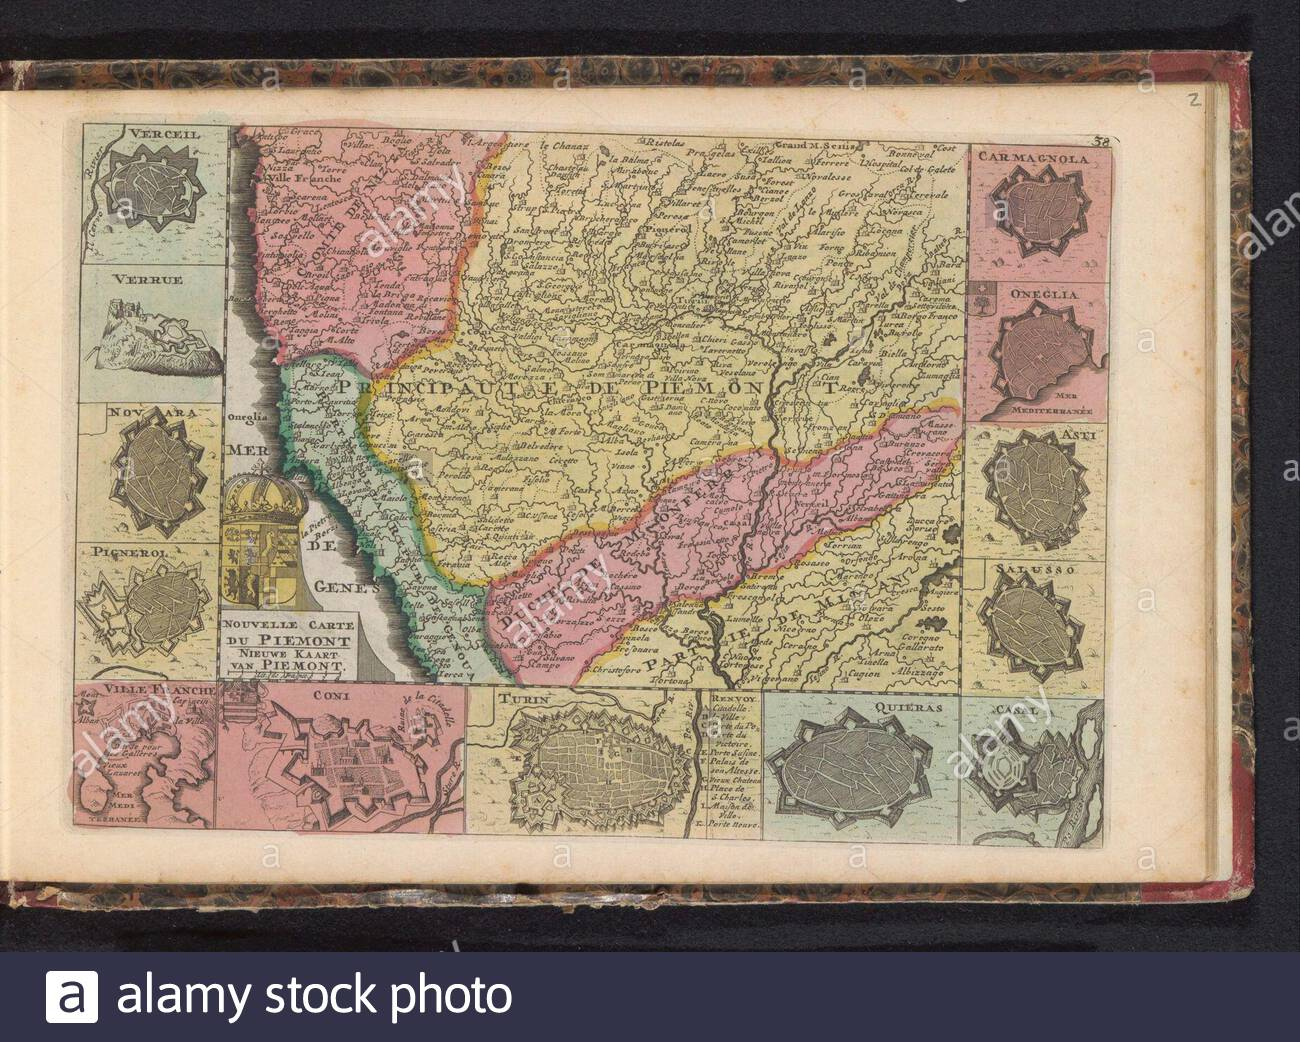 Kaart Van Piemonte Nouvelle Carte Du Piemont Nieuwe Kaart destiné Carte Nouvelle Region